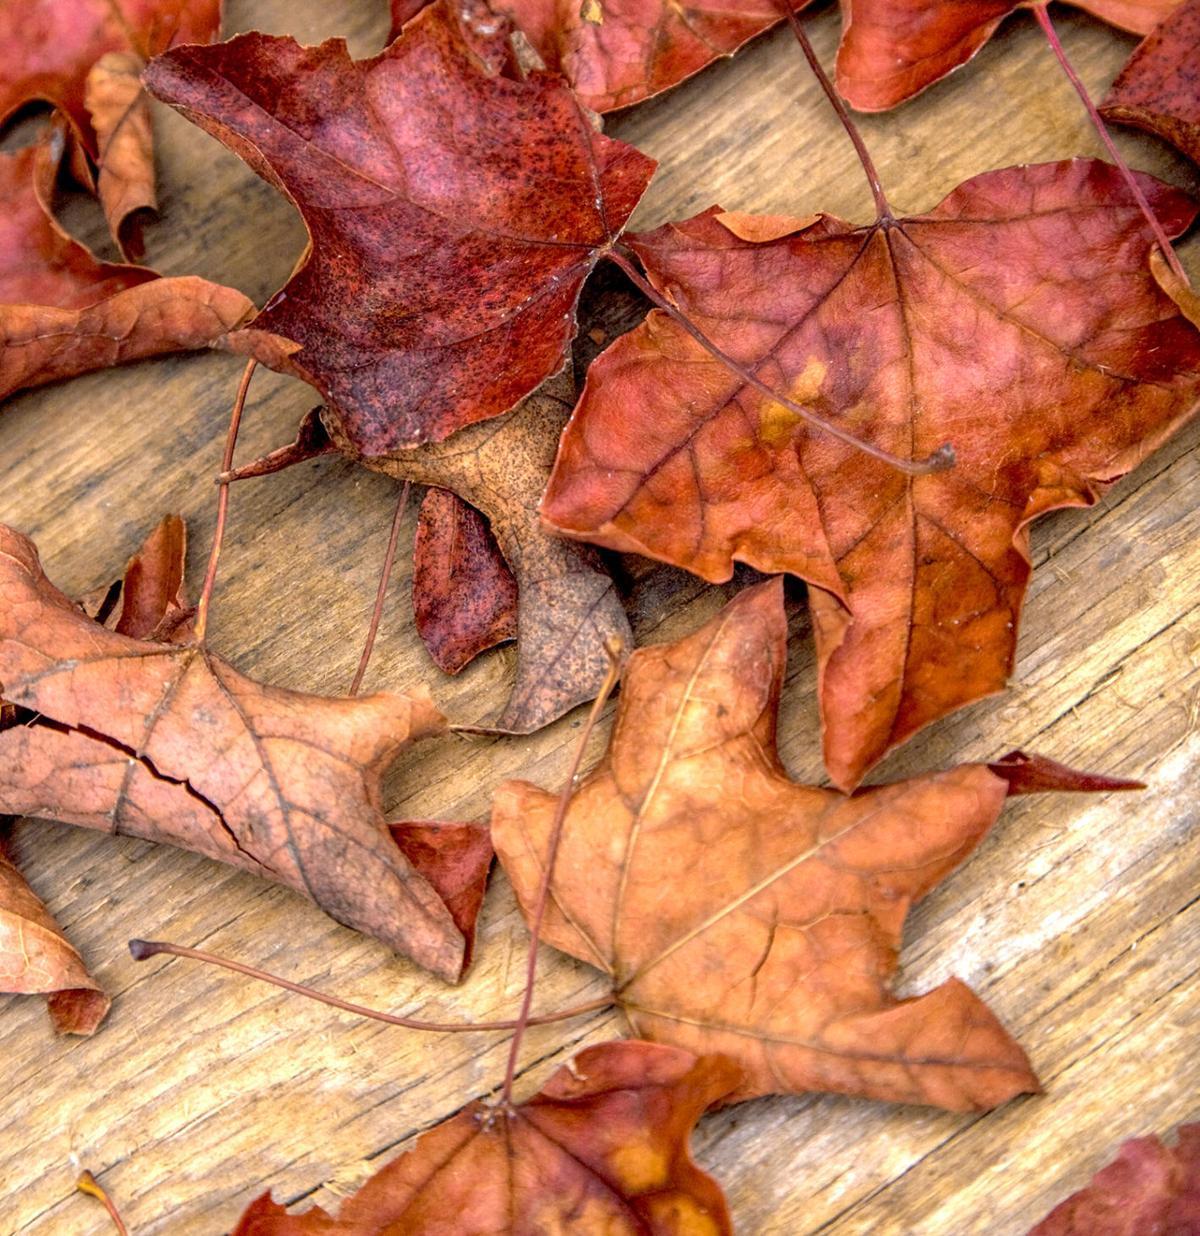 Autumn equinox heralds beginning of fall